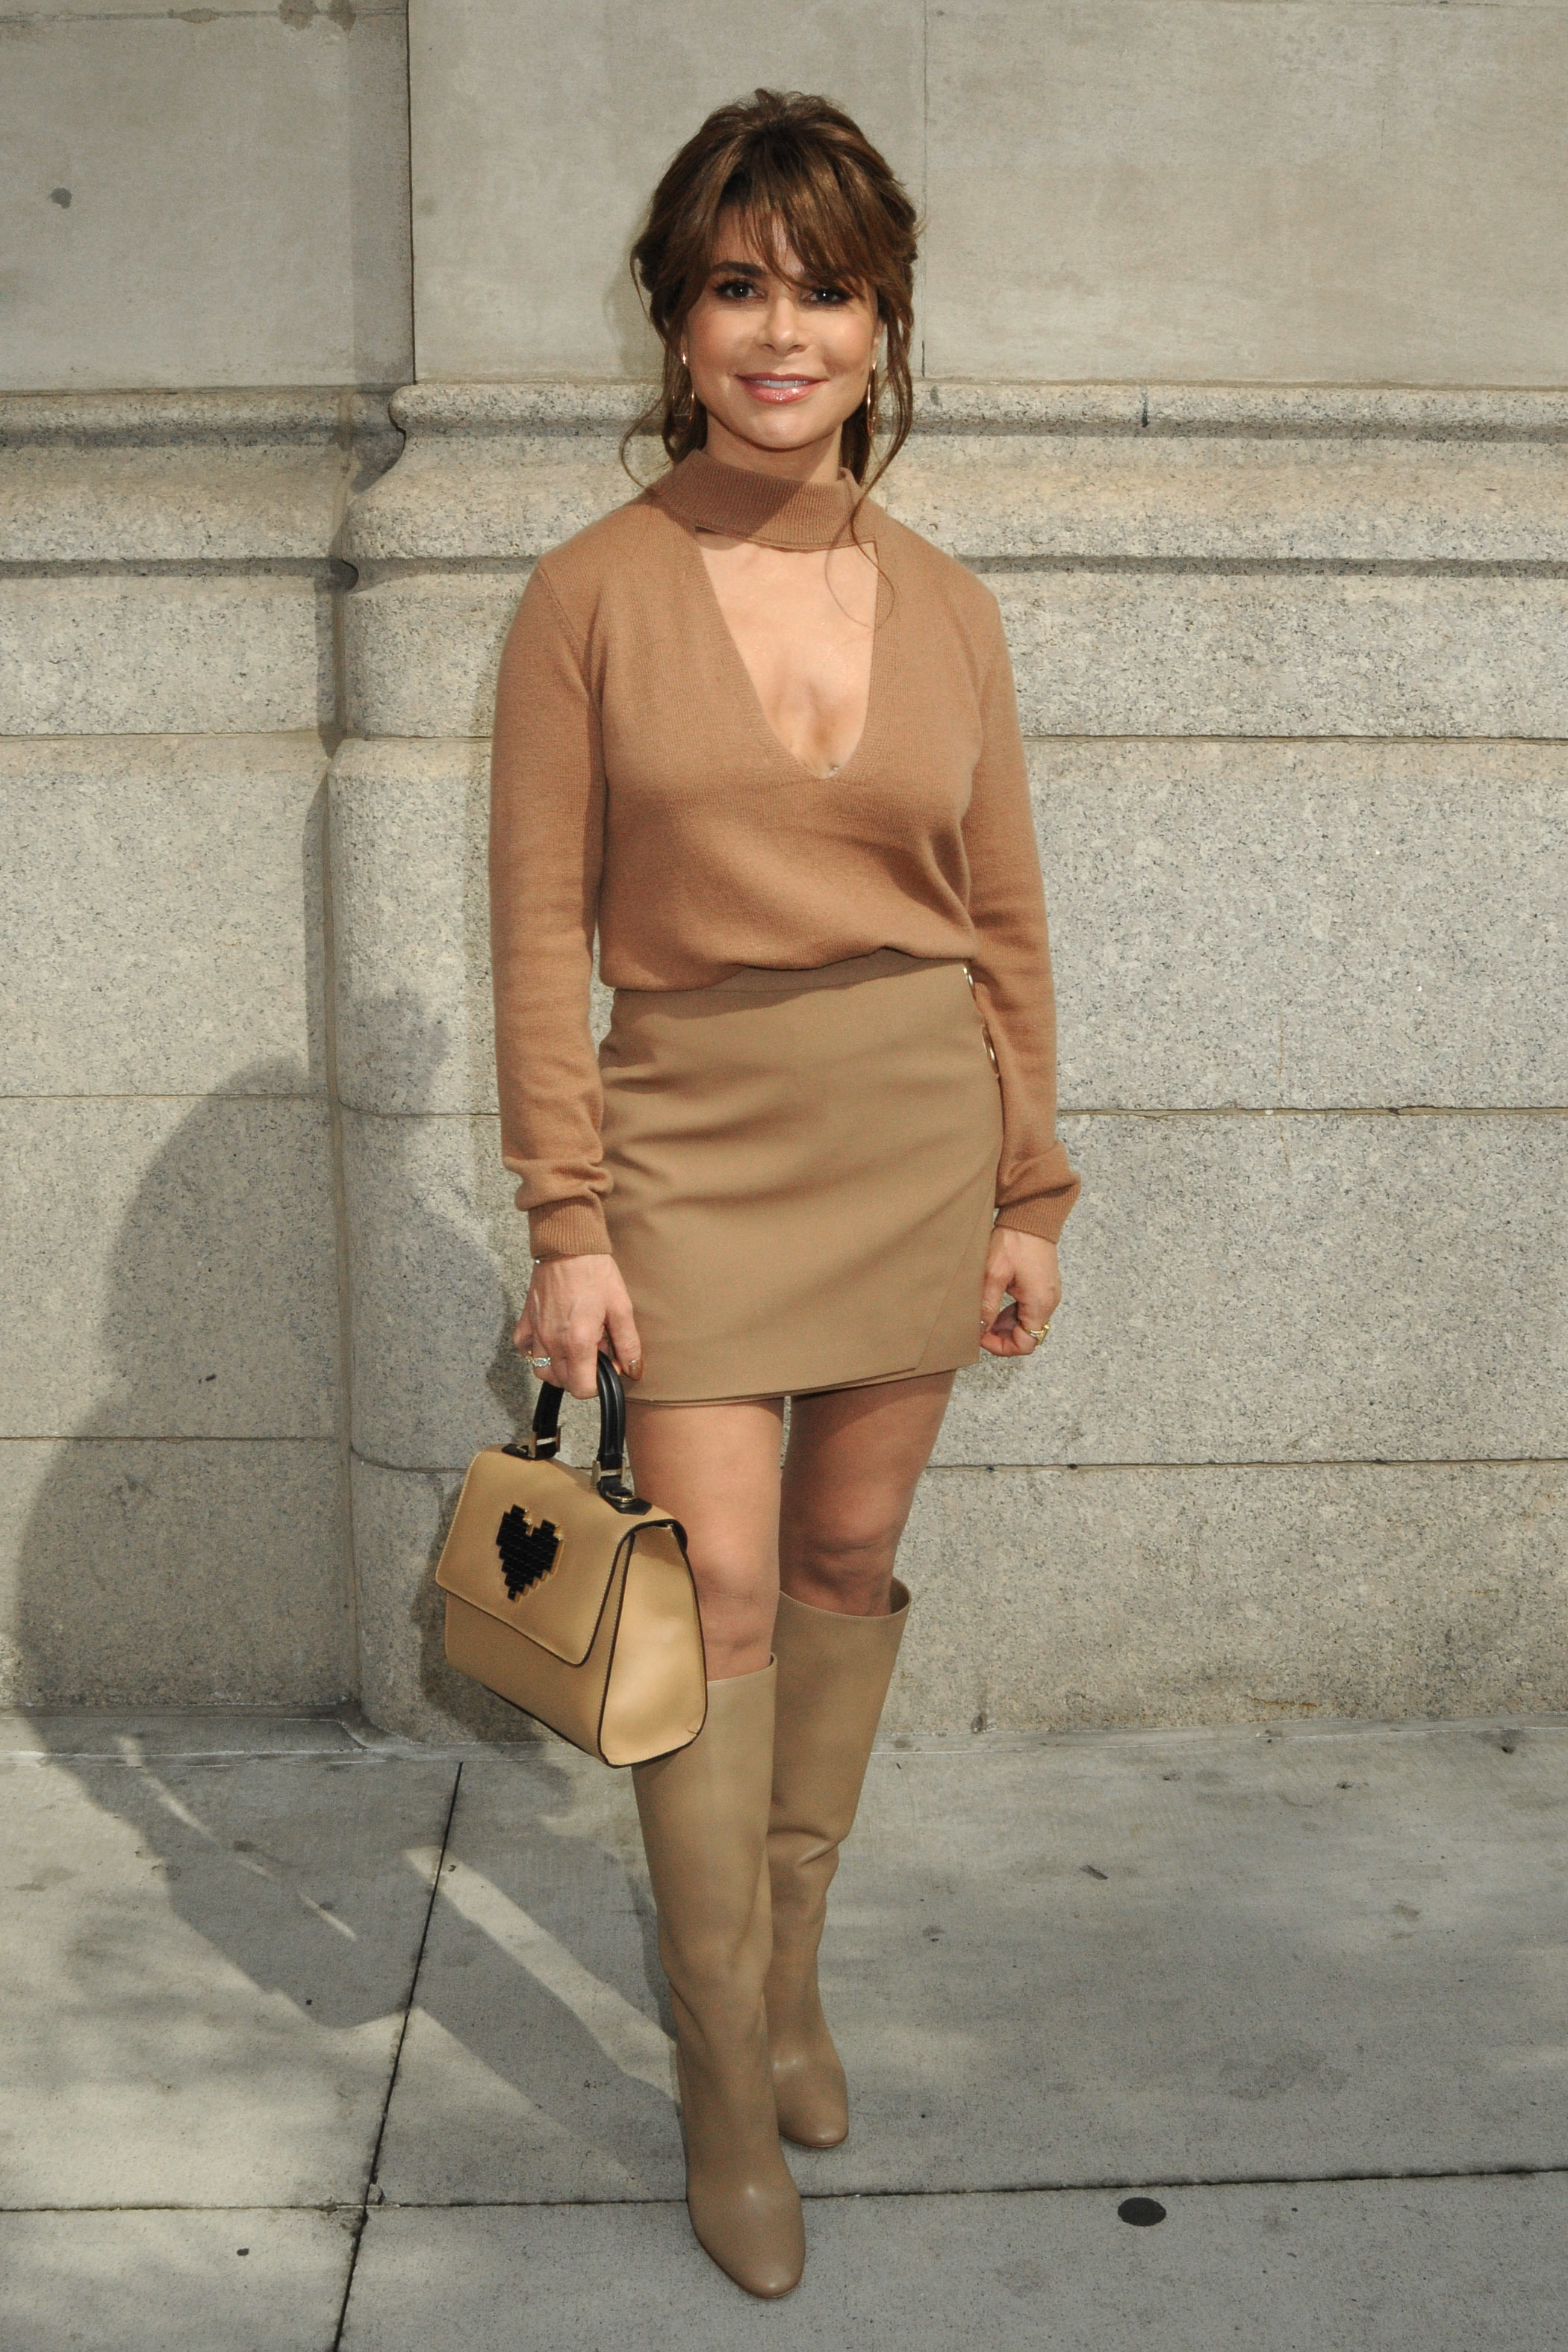 Paula Abdul attends the GREY Jason Wu Spring/Summer 2018 Presentation during New York Fashion Week in New York City on Sept. 11, 2017.